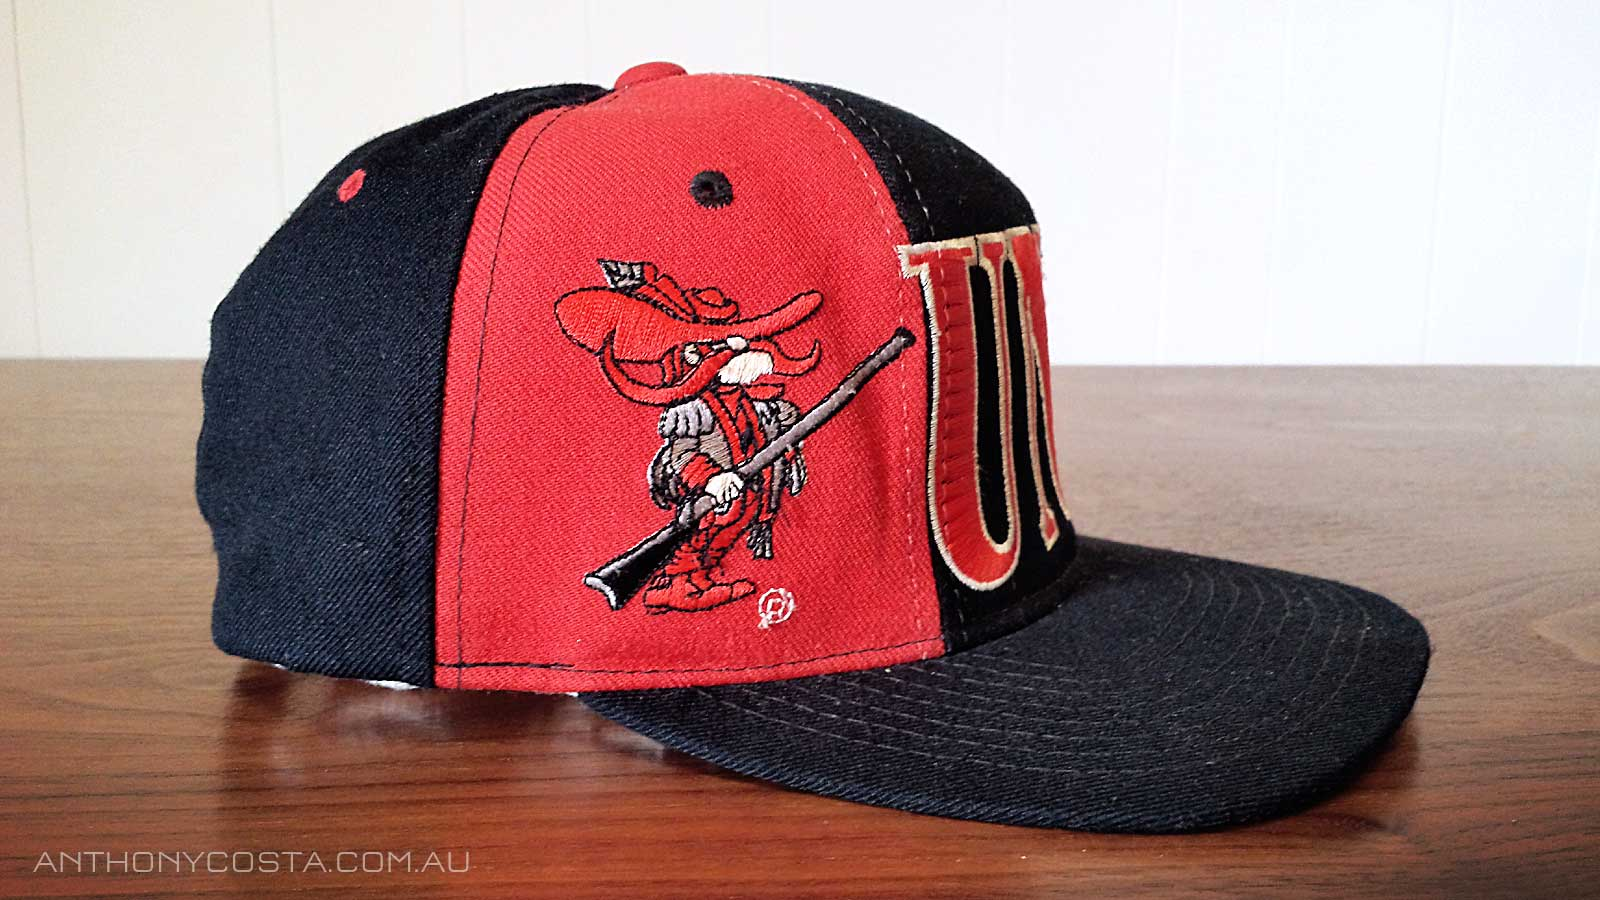 UNLV Runnin Rebels Starter hat